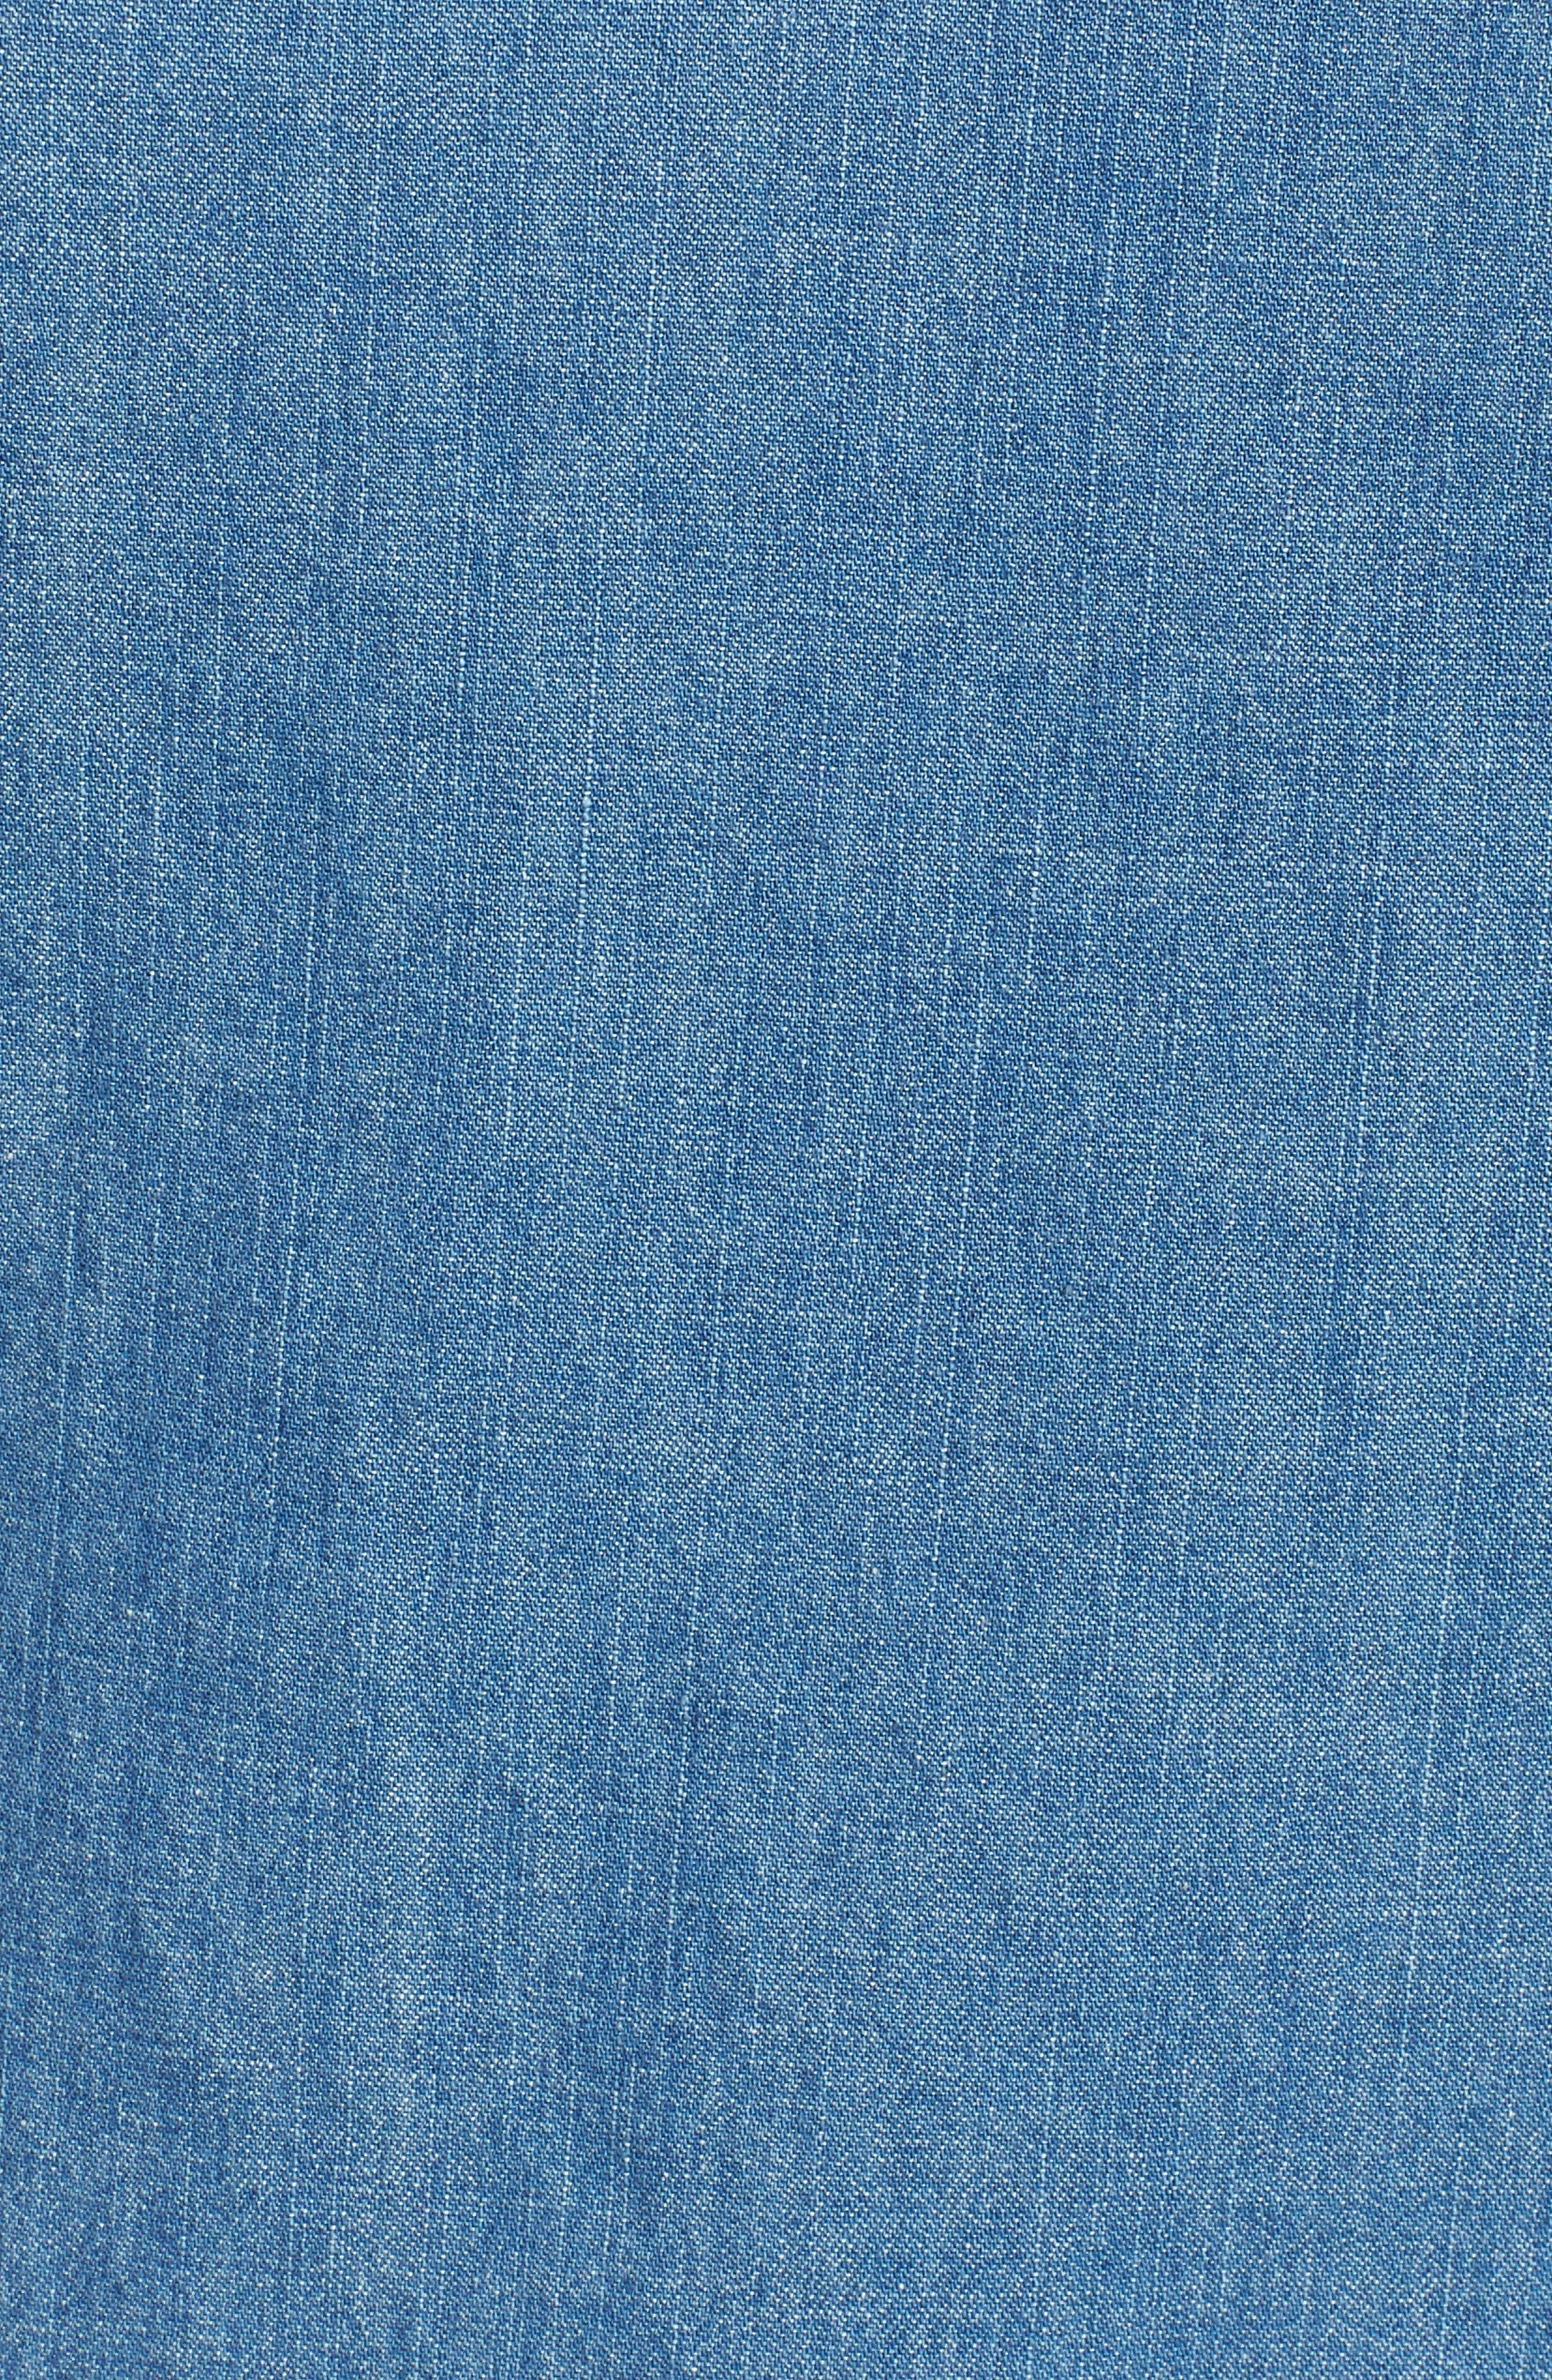 Casual Chambray Ruffle Sleeve Top,                             Alternate thumbnail 5, color,                             455